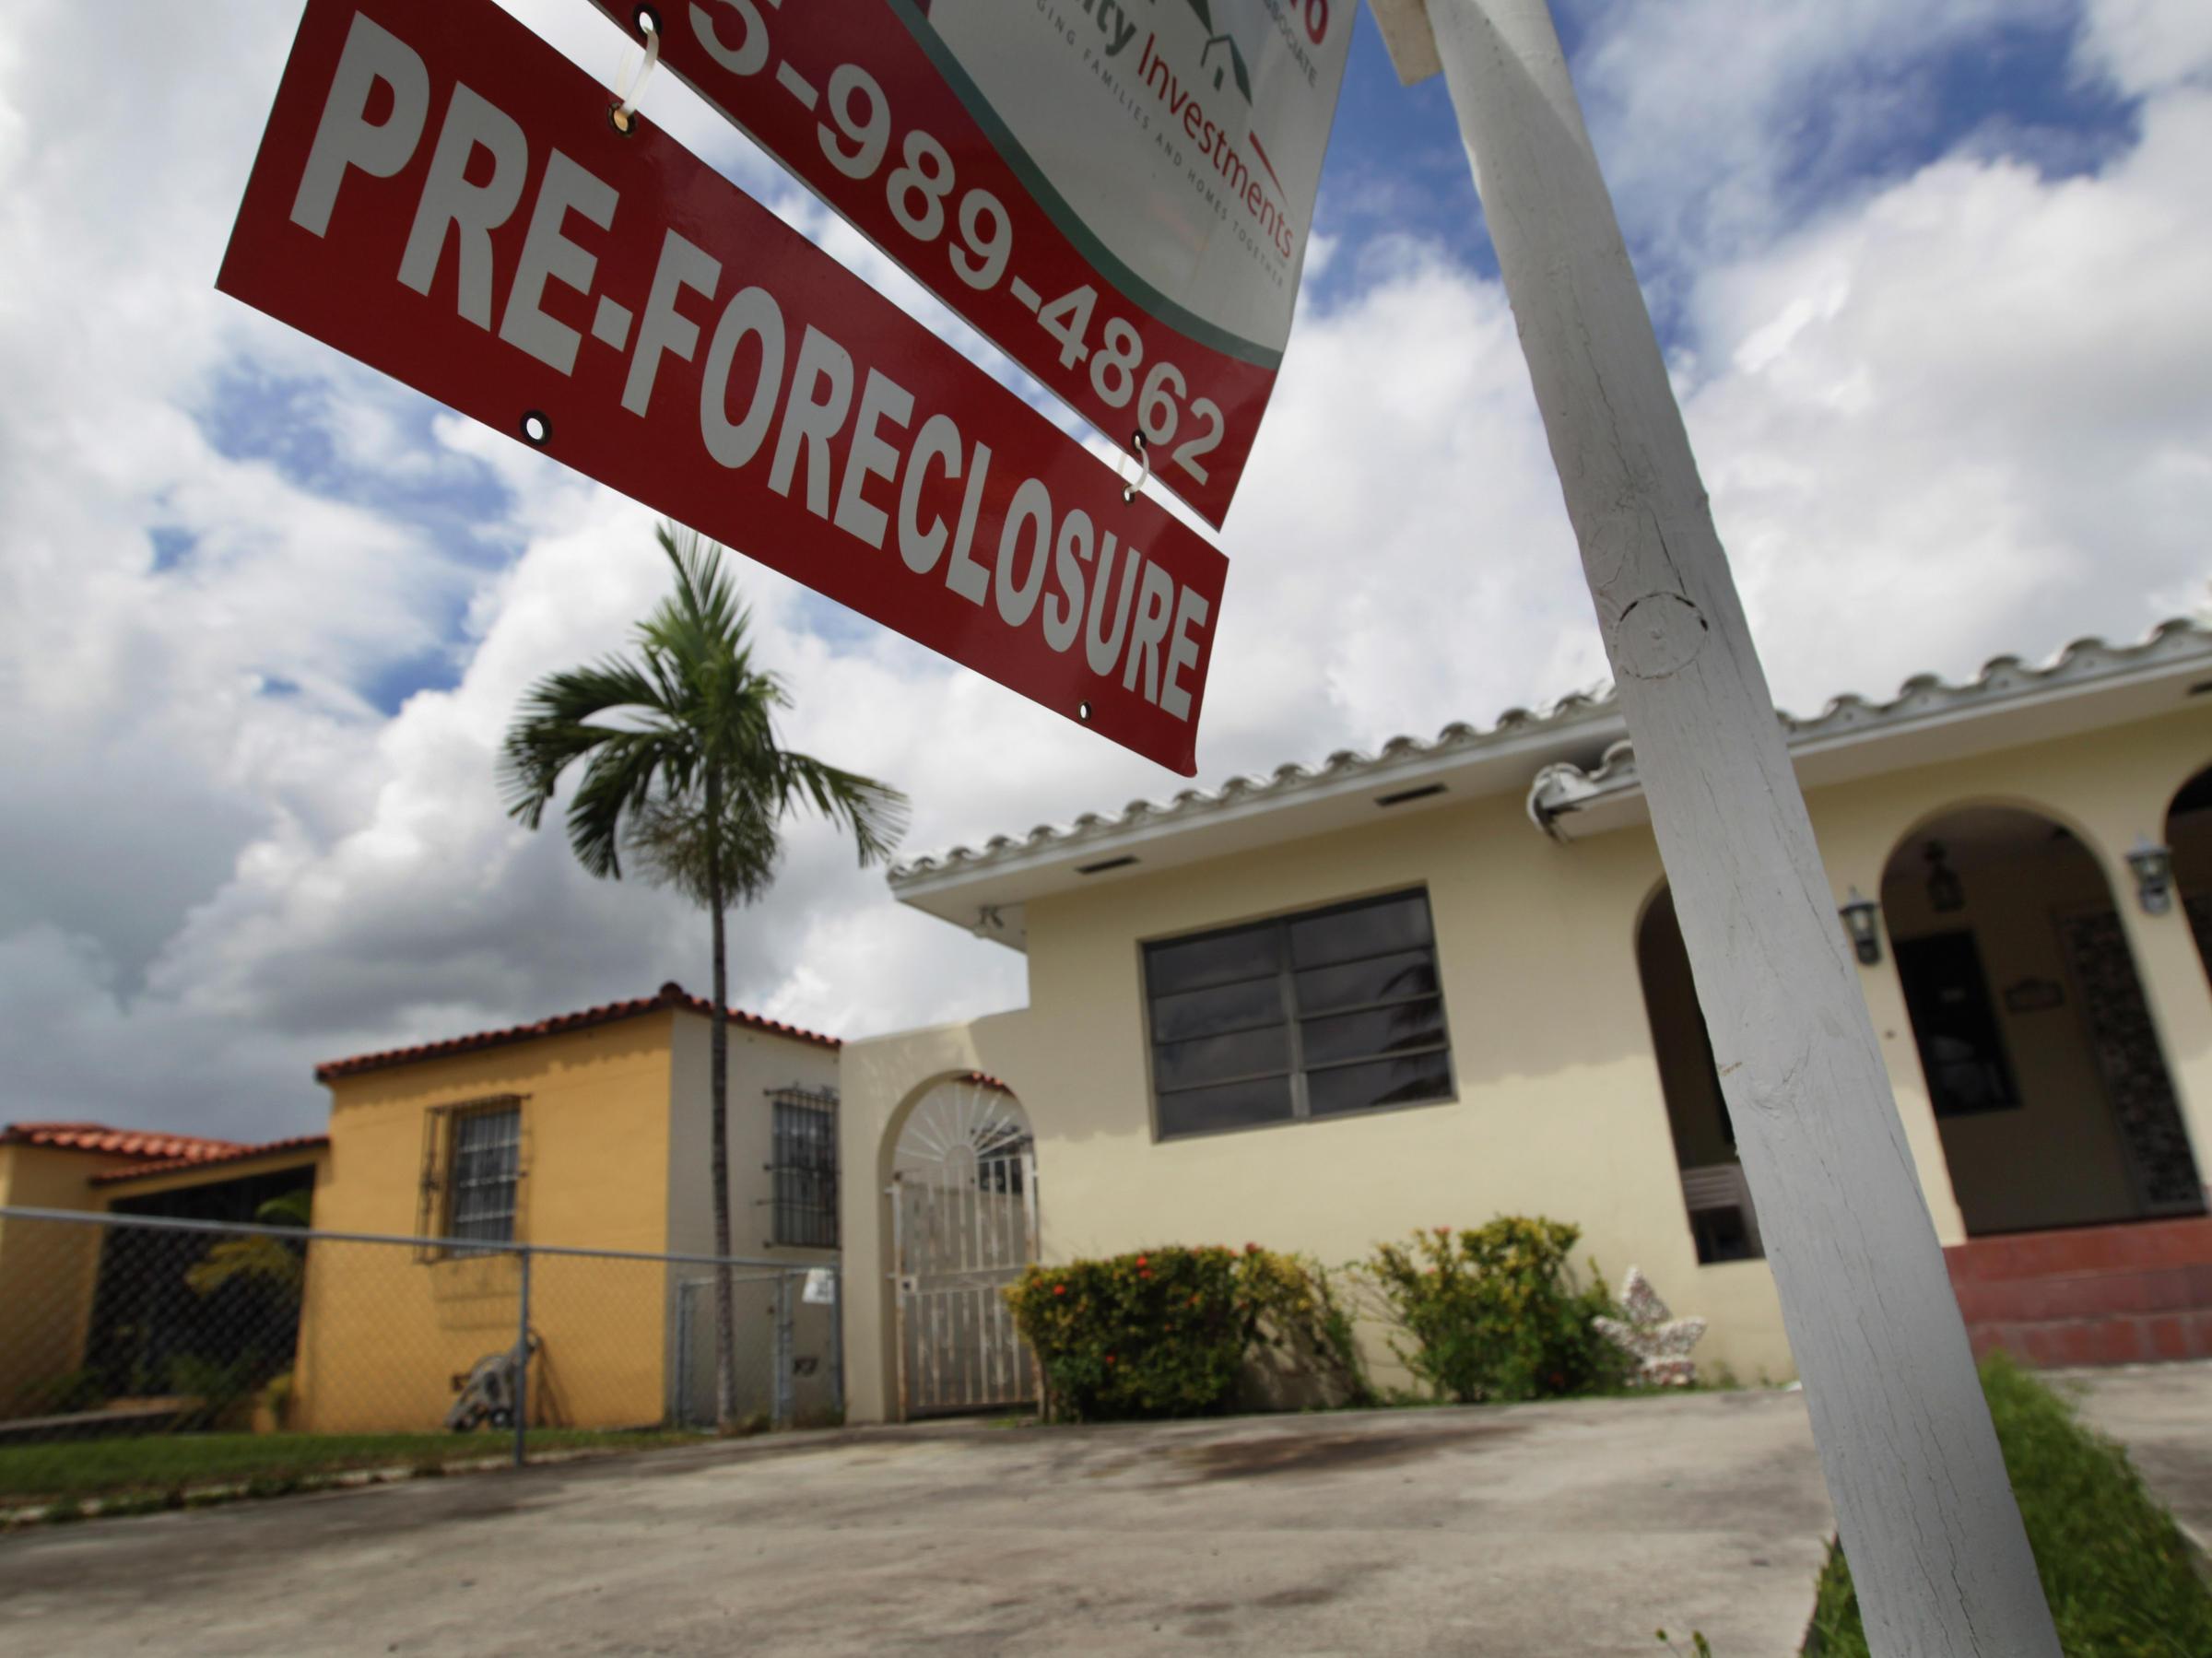 Foreclosure Process Hammers Florida's Housing Market | KUNC